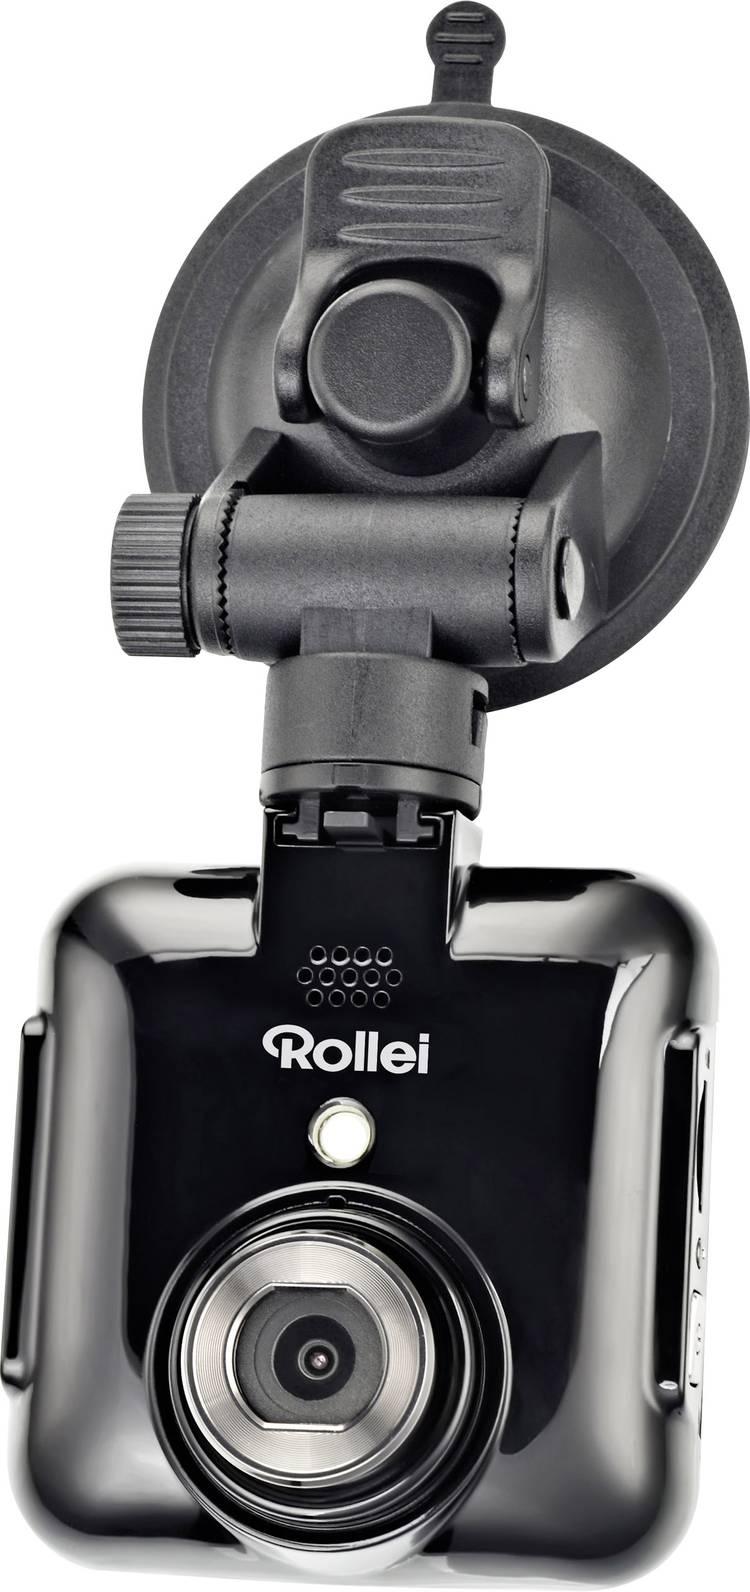 Rollei DVR-71 Dashcam Kijkhoek horizontaal (max.): 120  12 V Accu. Display. Microfoon